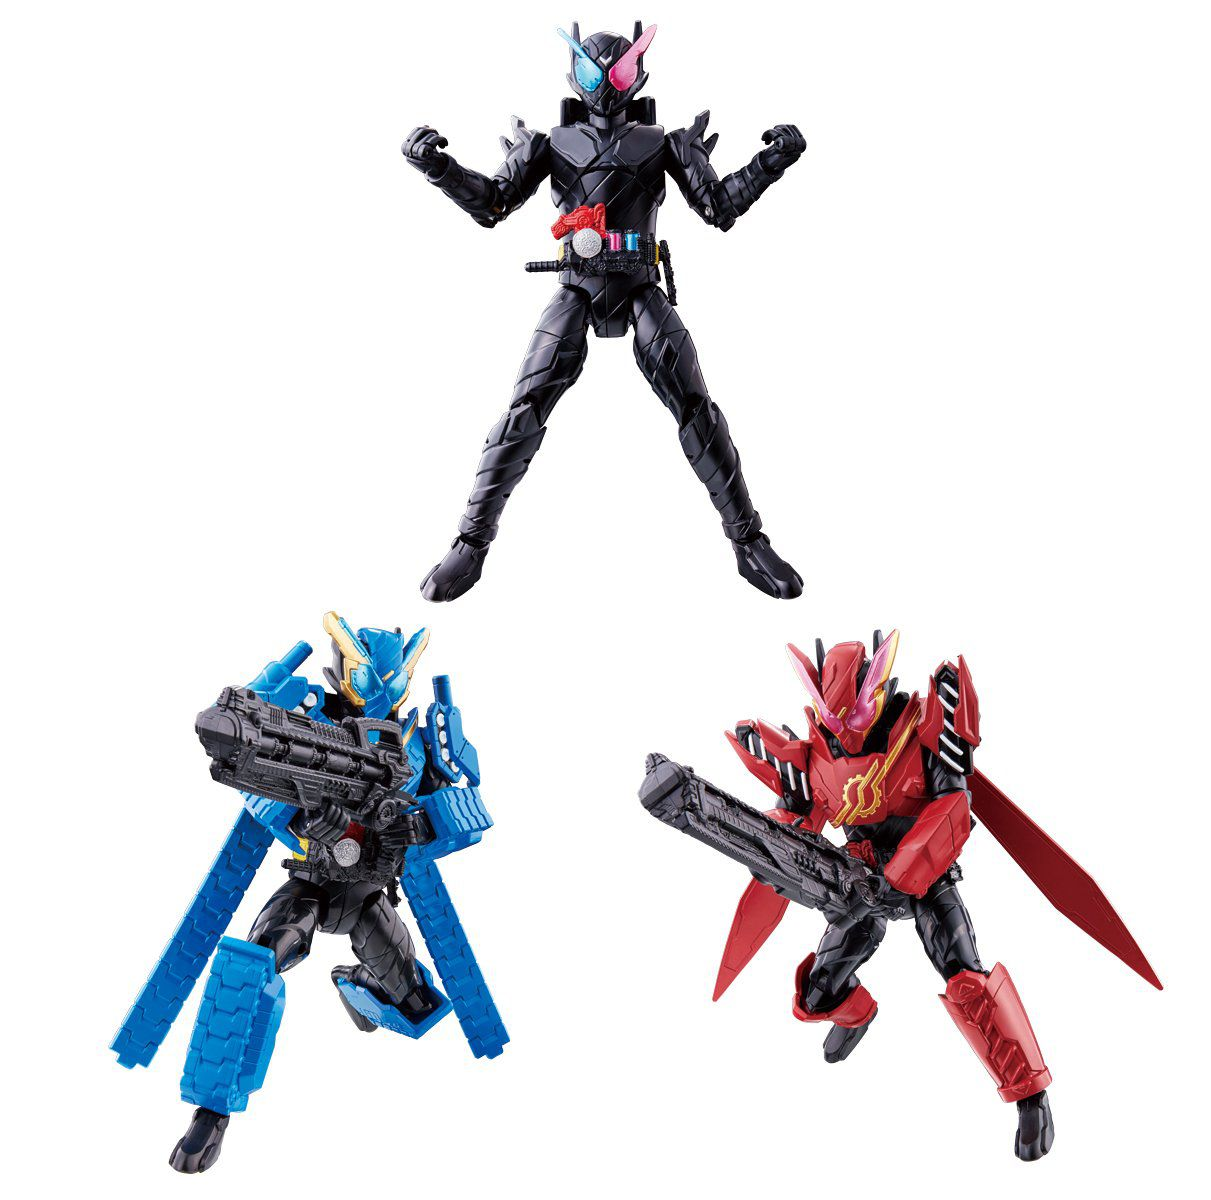 Kamen Rider - Build BCR 12 - Bandai